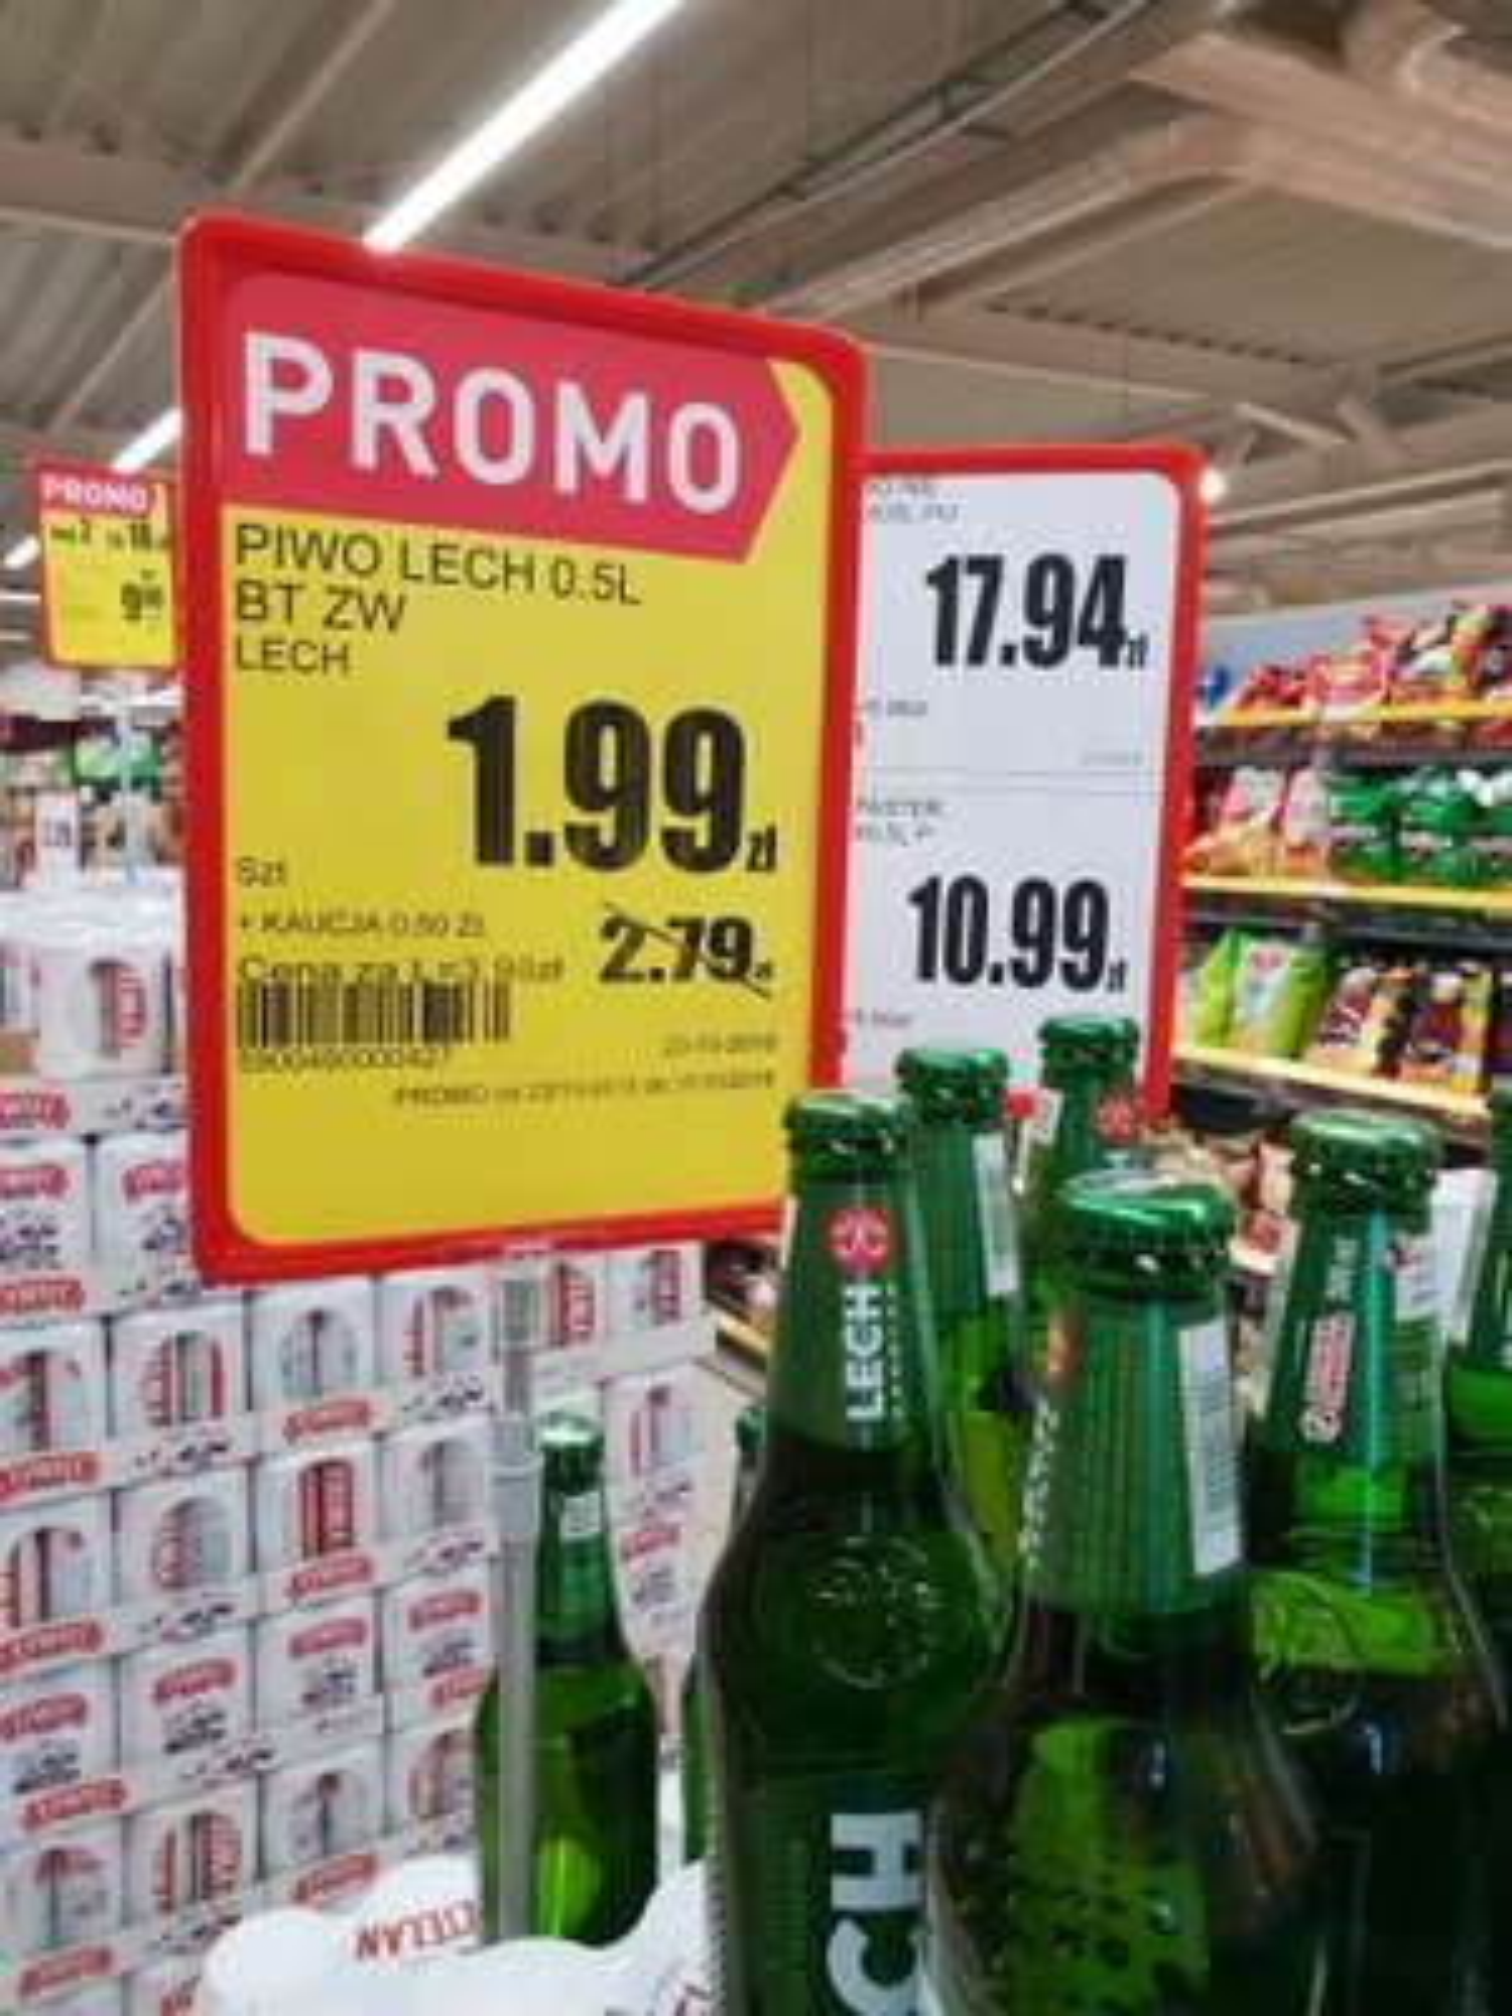 Lech Premium Intermarche Środa Wielkopolska